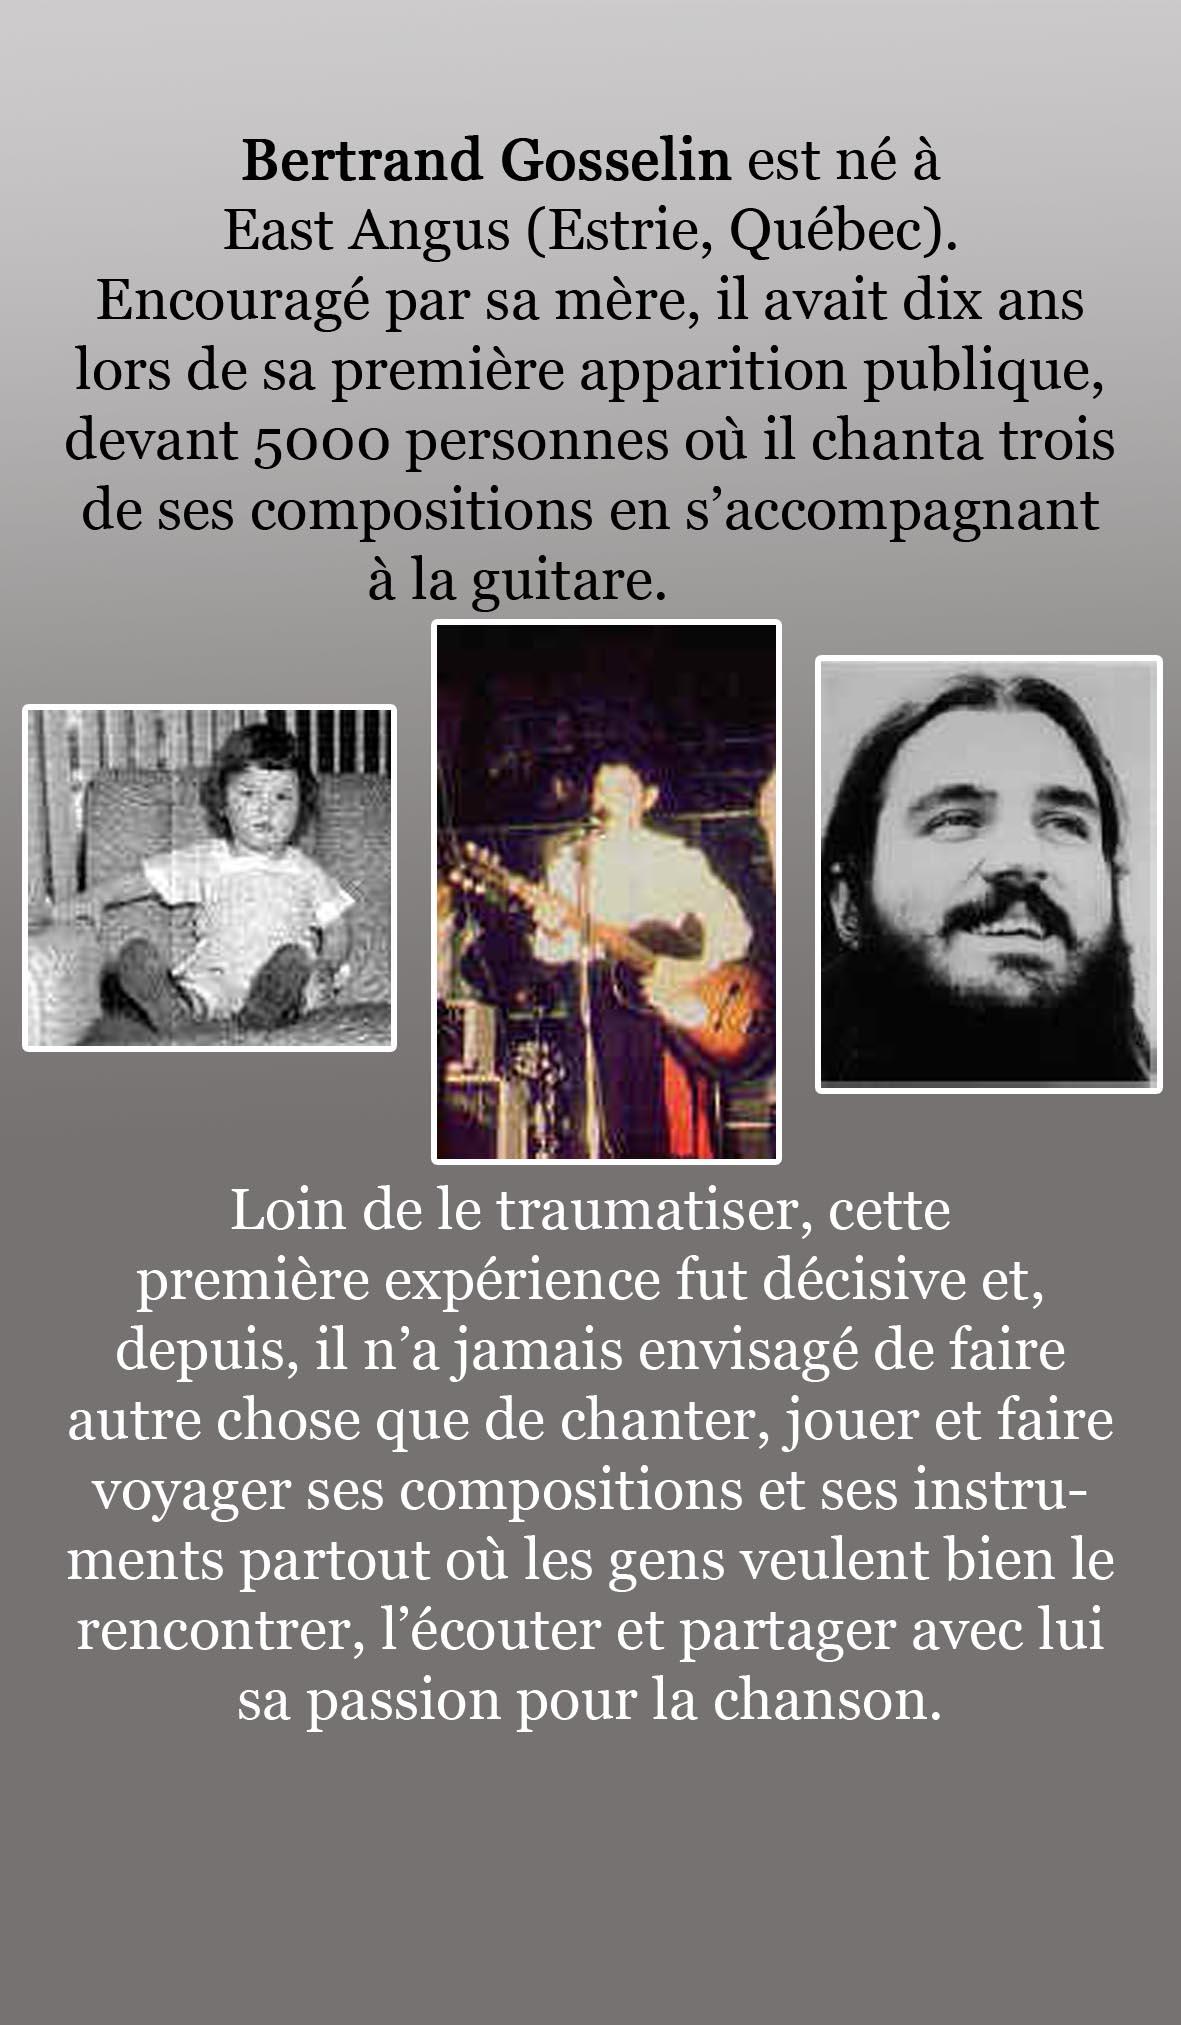 Bio Bertrand Gosselin